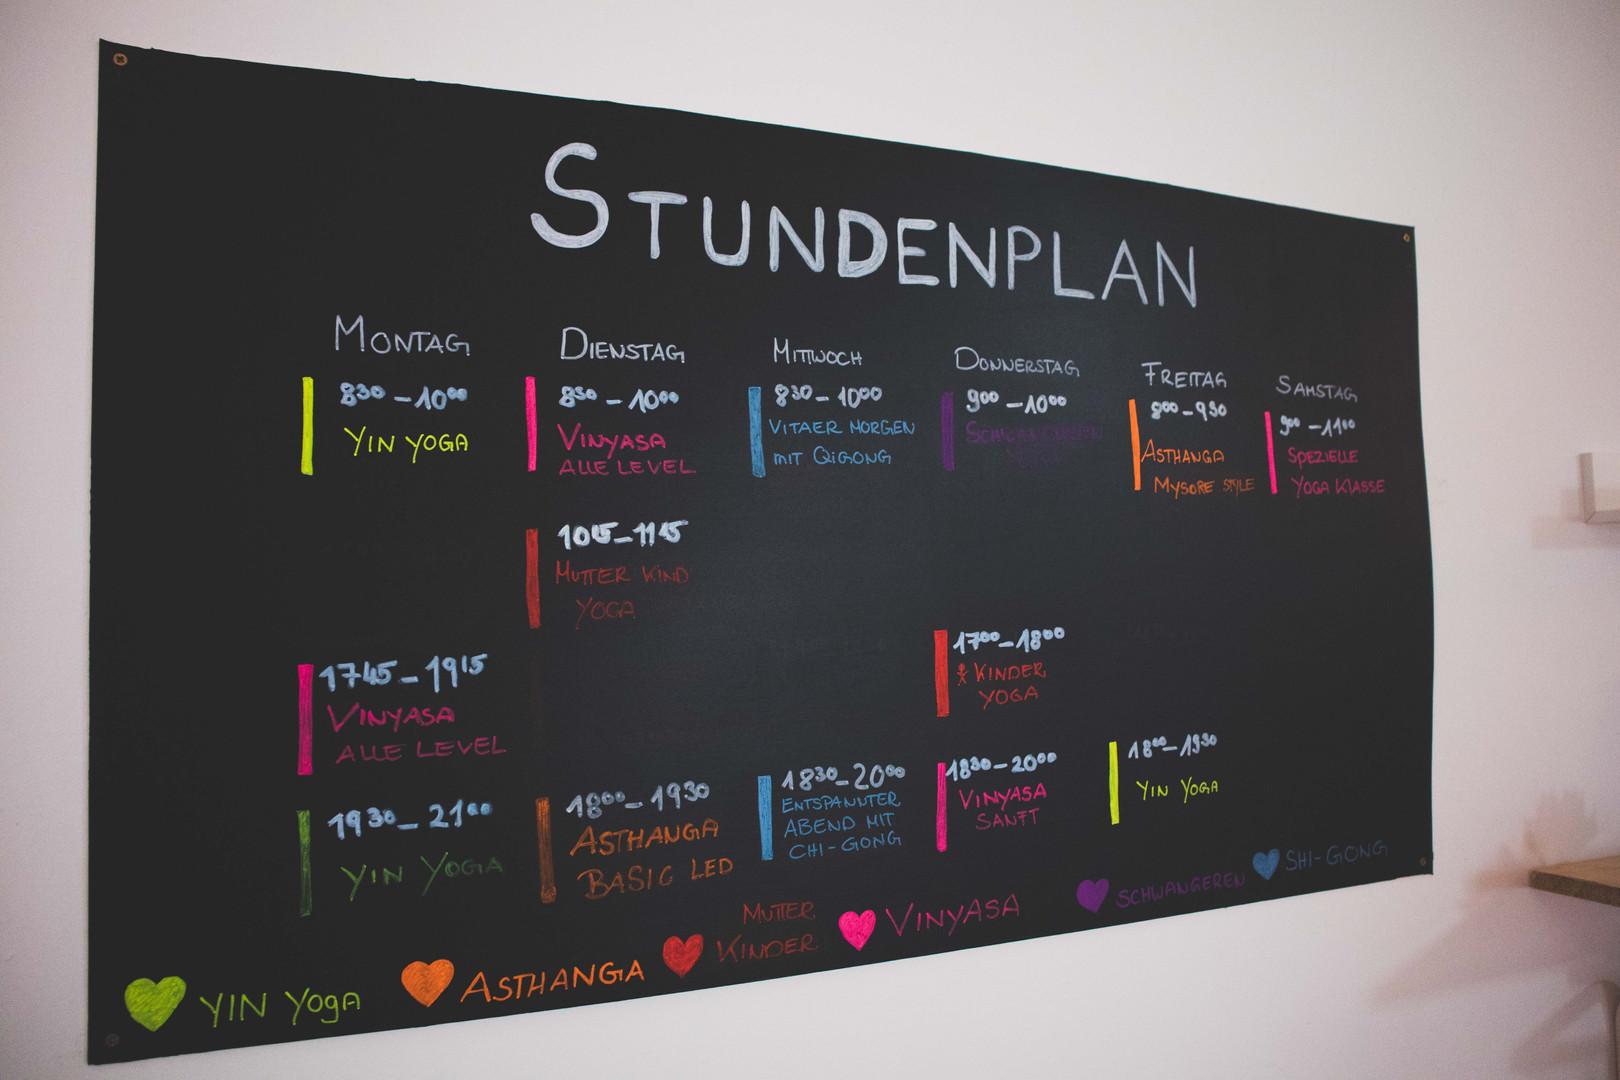 Studenplan 2019